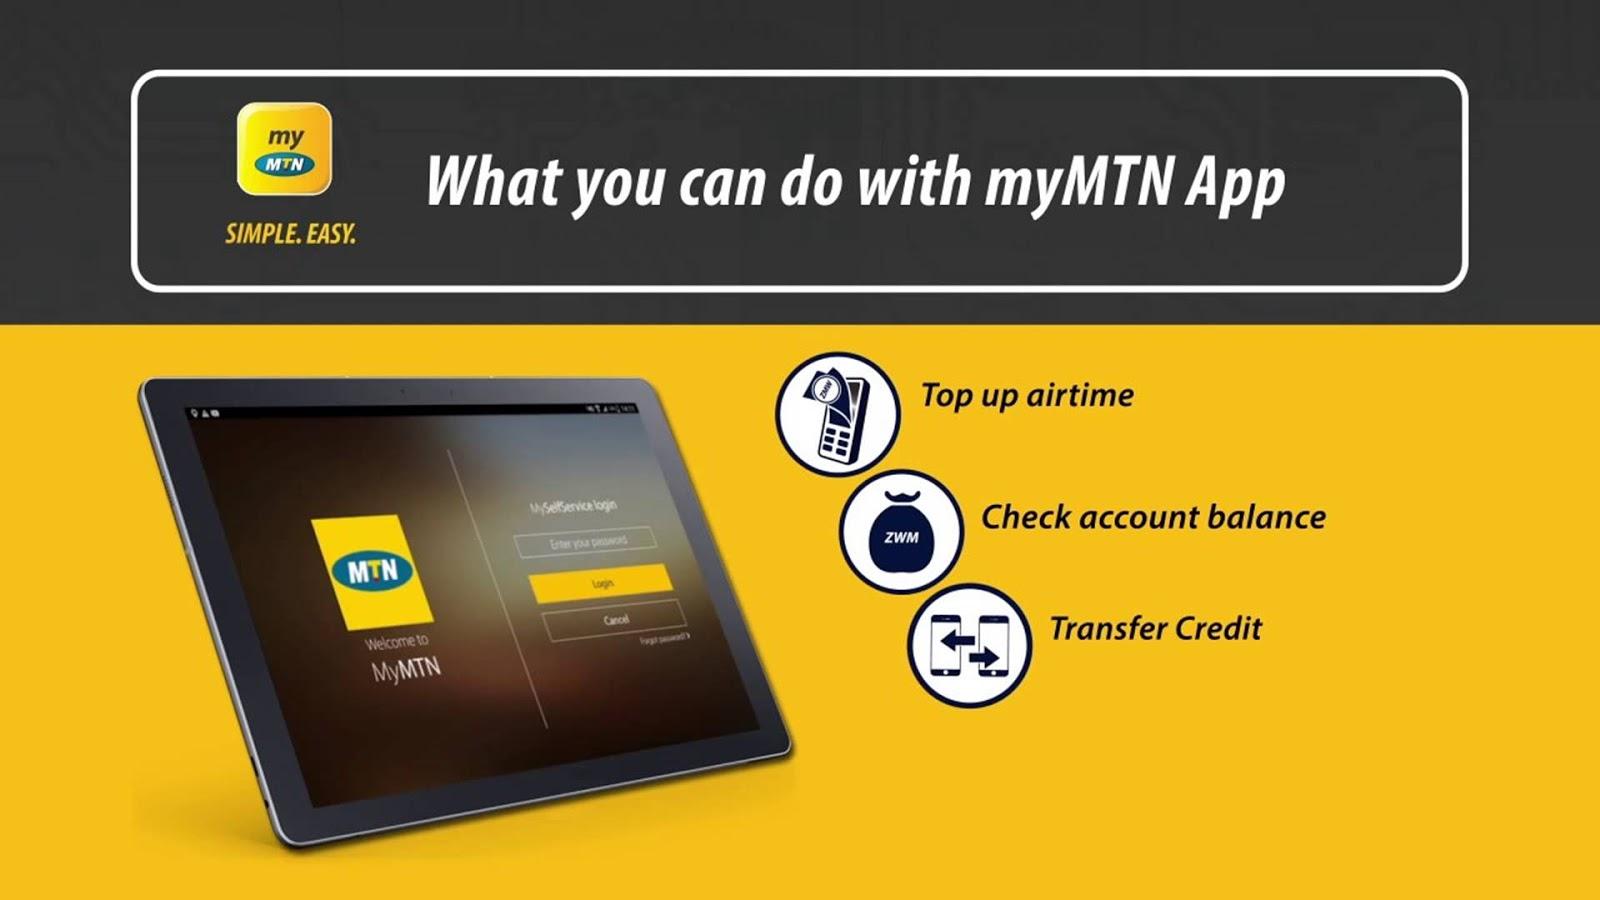 mymtn app functions